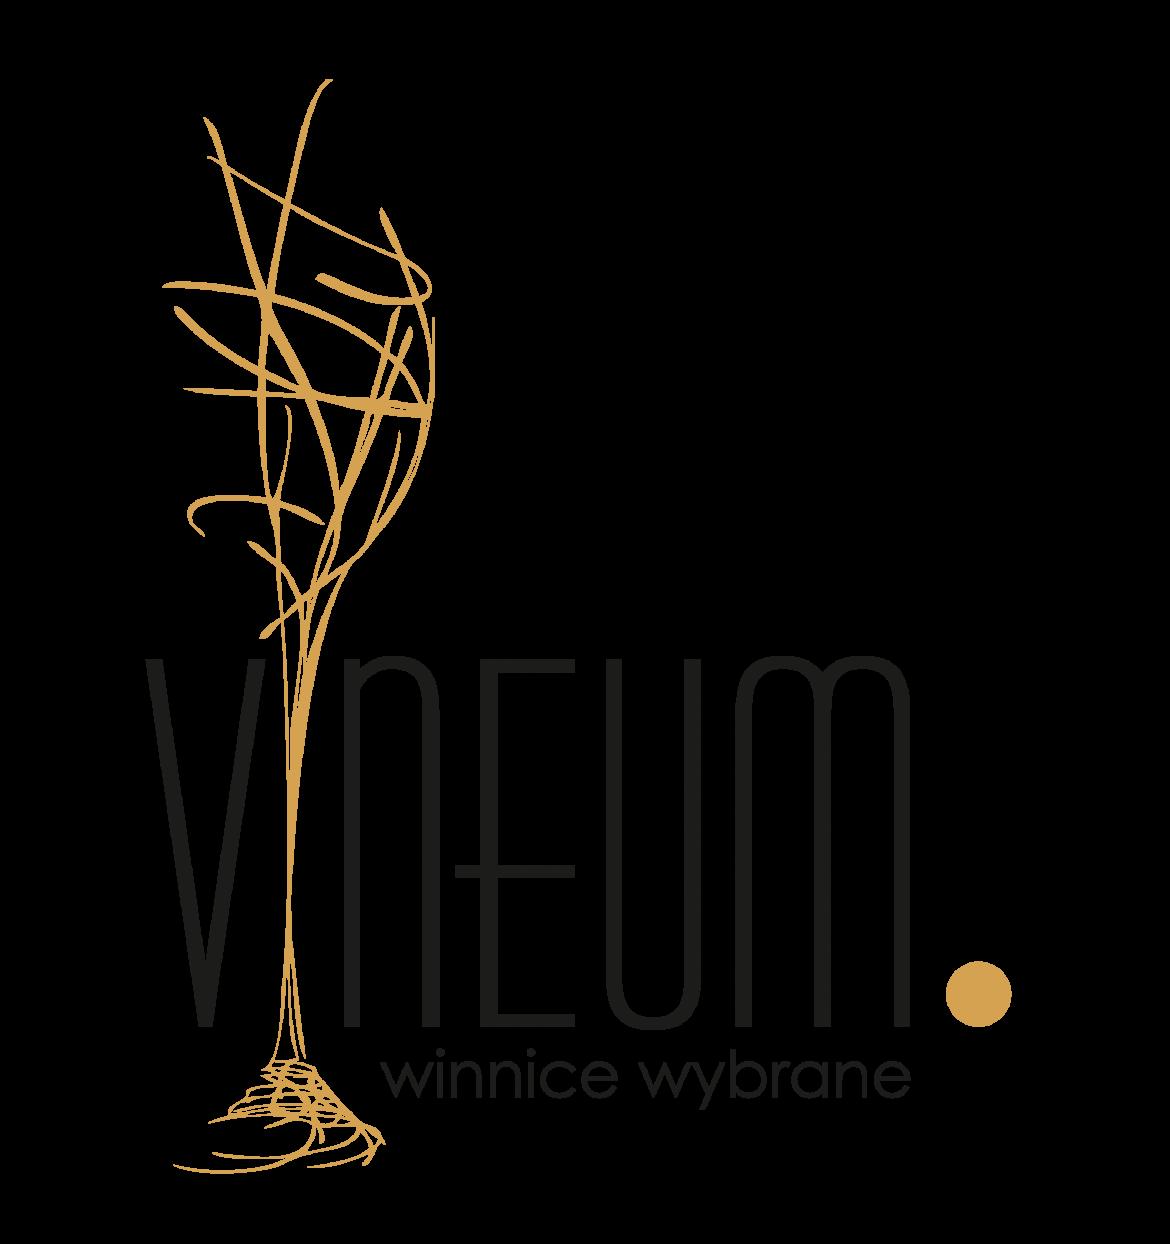 logo_VINEUM_HiRes_no_background.png